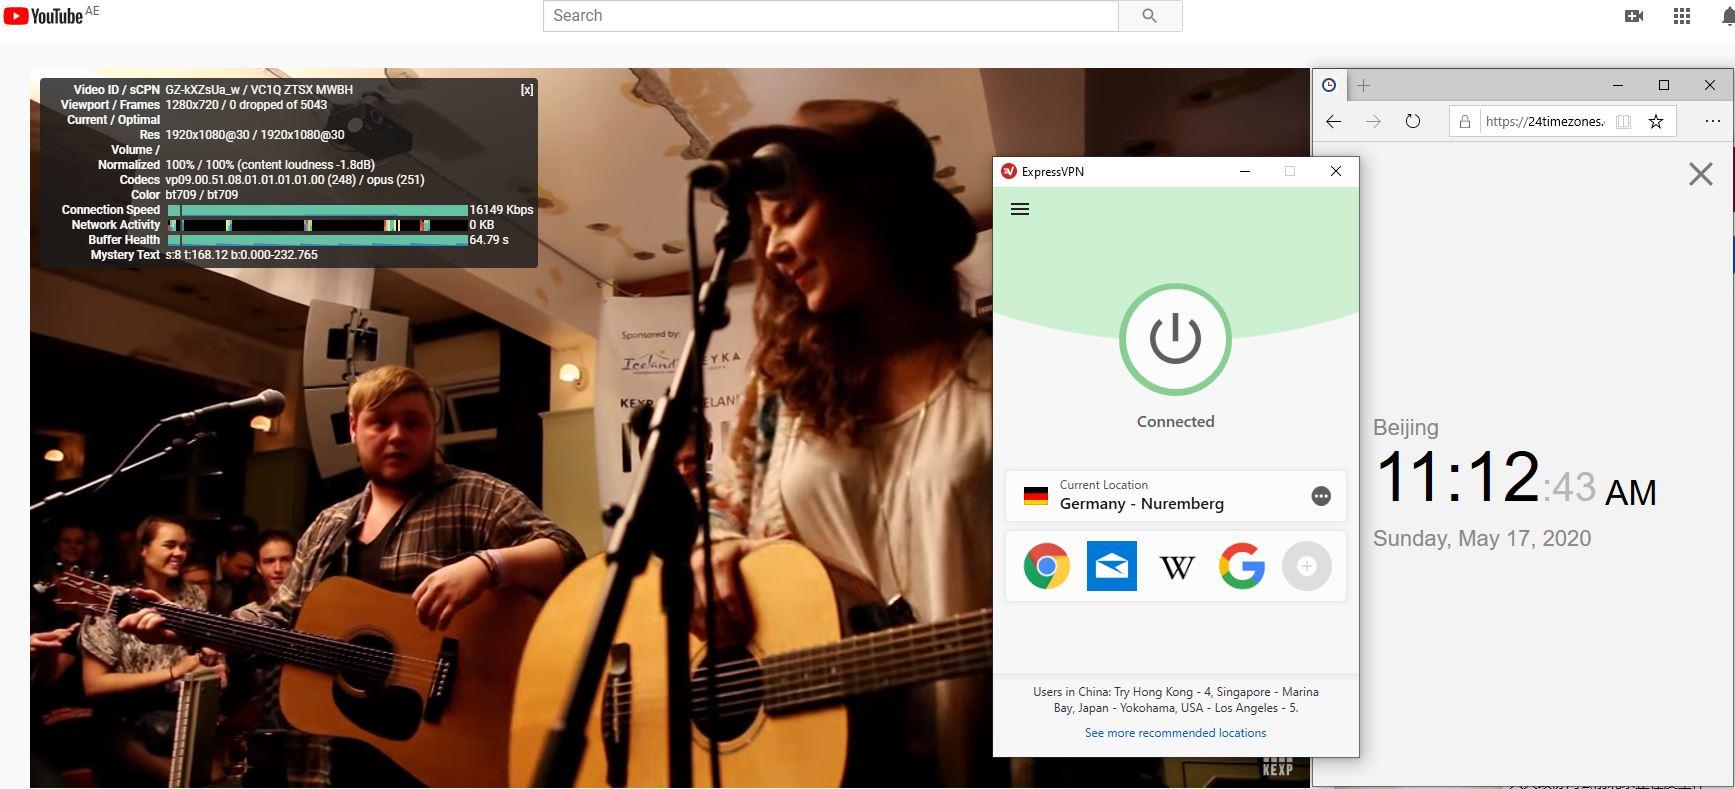 Windows10 ExpressVPN Germany - Nuremberg 中国VPN 翻墙 科学上网 youtube测速-20200517-2